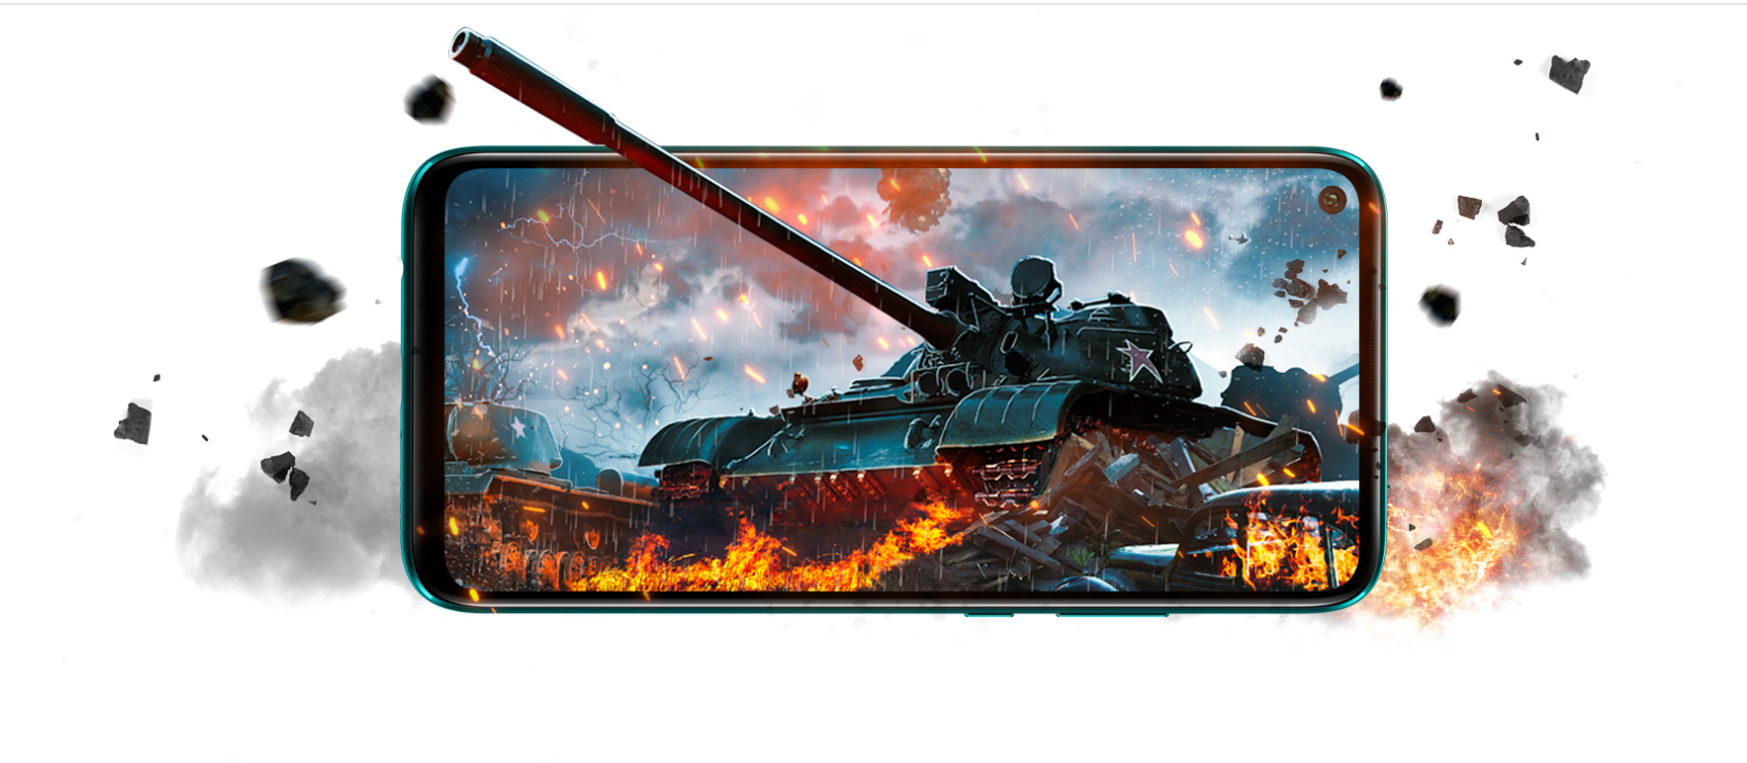 Huawei Mate i5 Pro